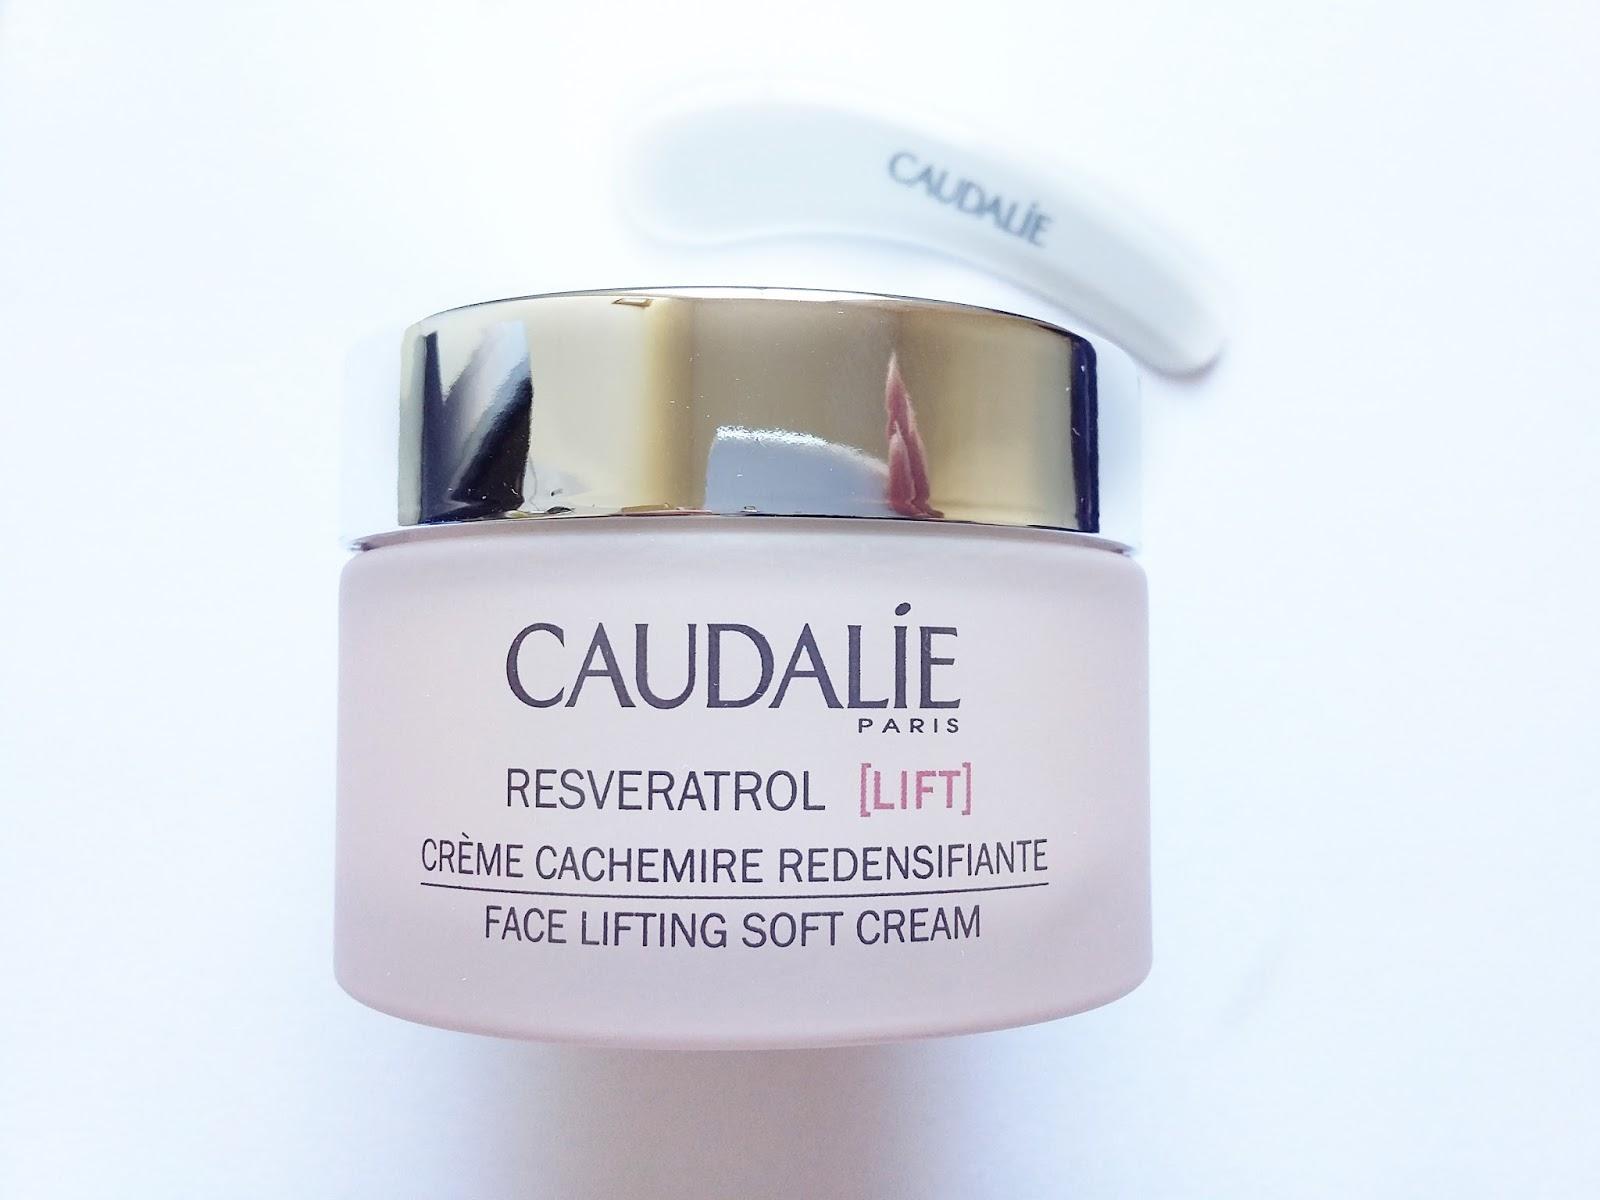 Resveratrol topical facial cream